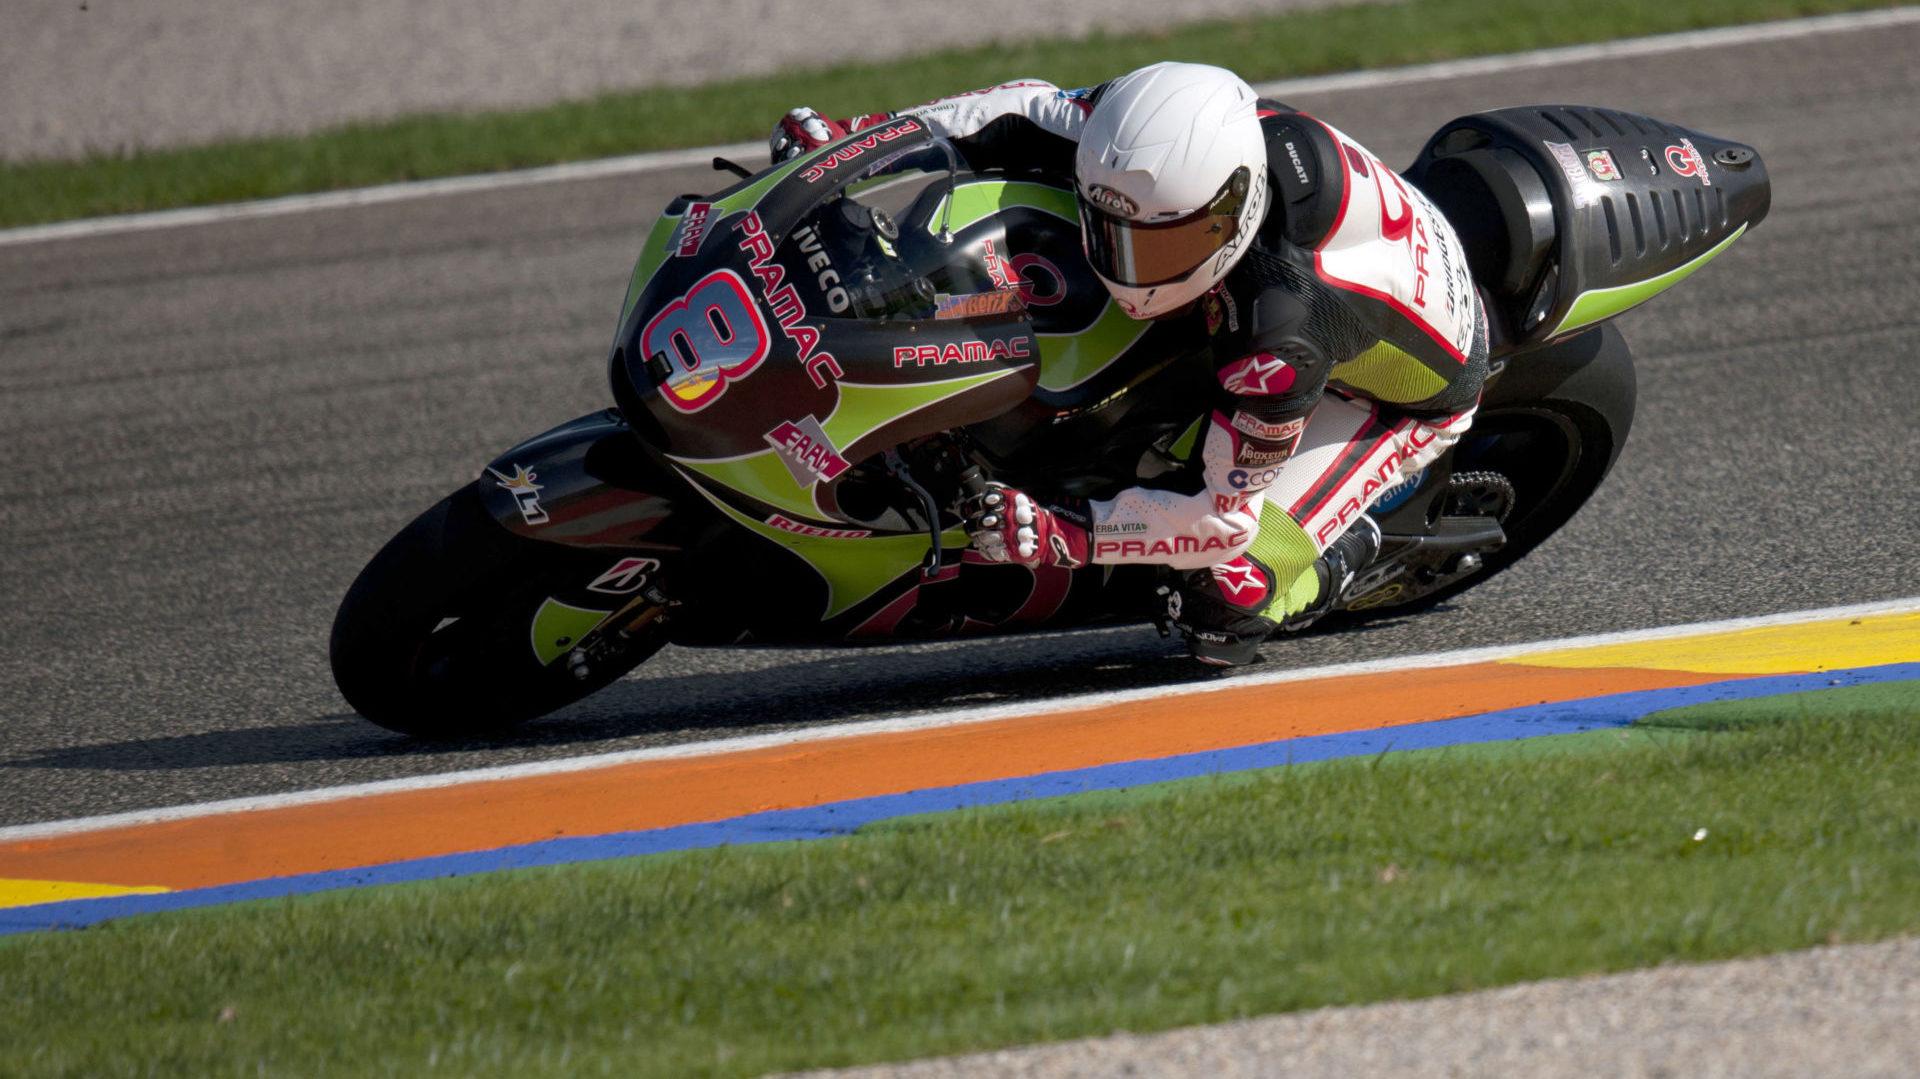 Hector Barbera (8) testing a Pramac Racing Ducati Desmosedici MotoGP bike at Valencia in 2011. Photo courtesy Pramac Racing.